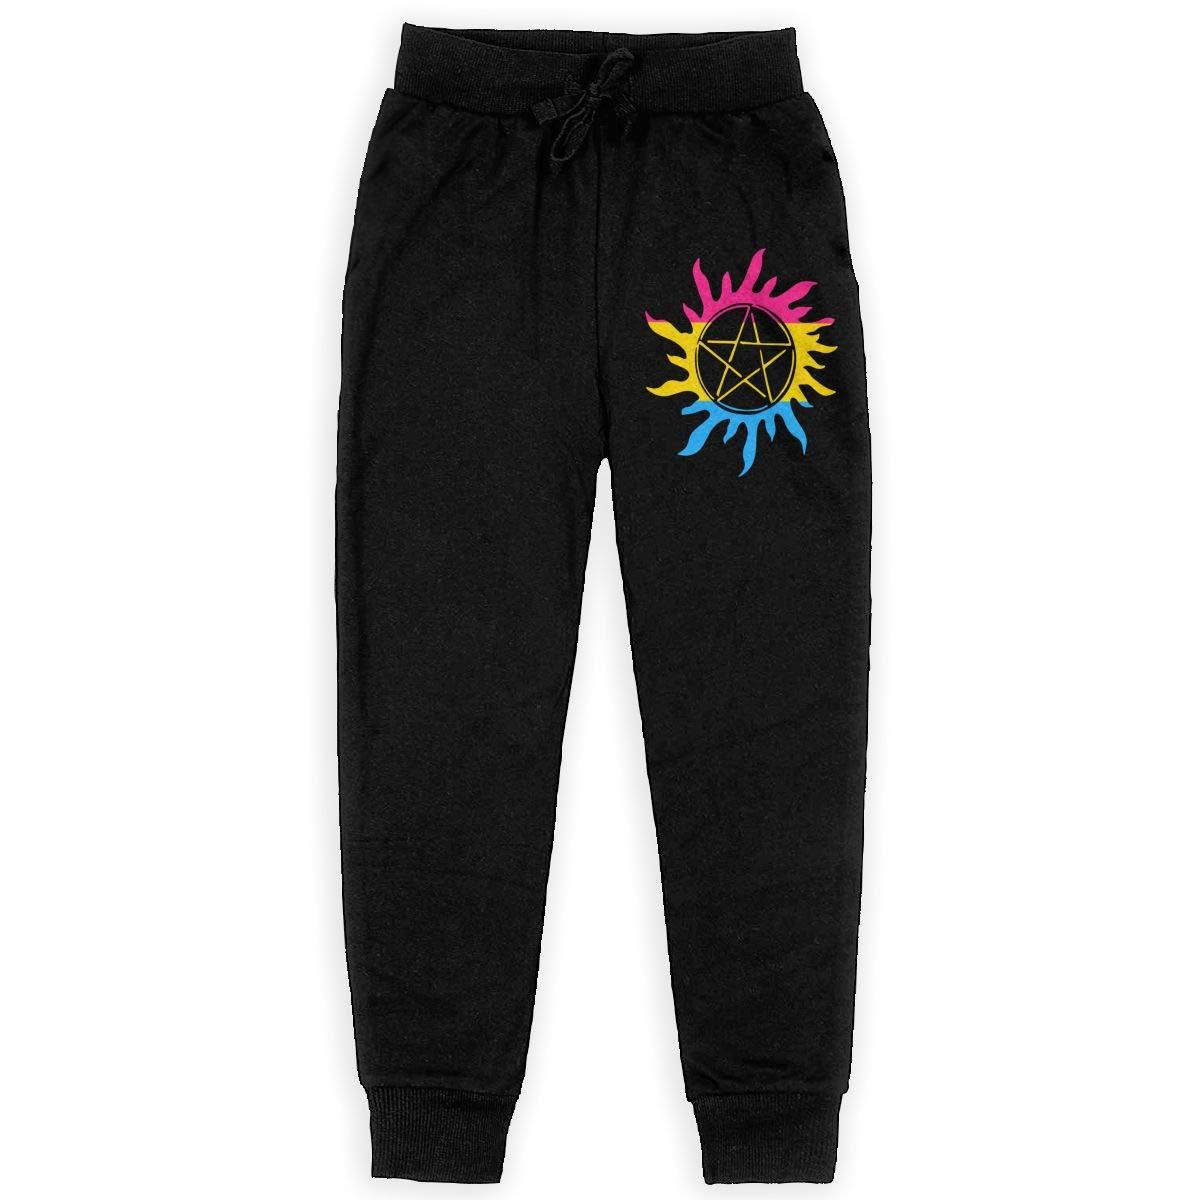 WYZVK22 Supernatural-Pansexual Pride Soft//Cozy Sweatpants Teenager Fleece Pants for Teenager Boys